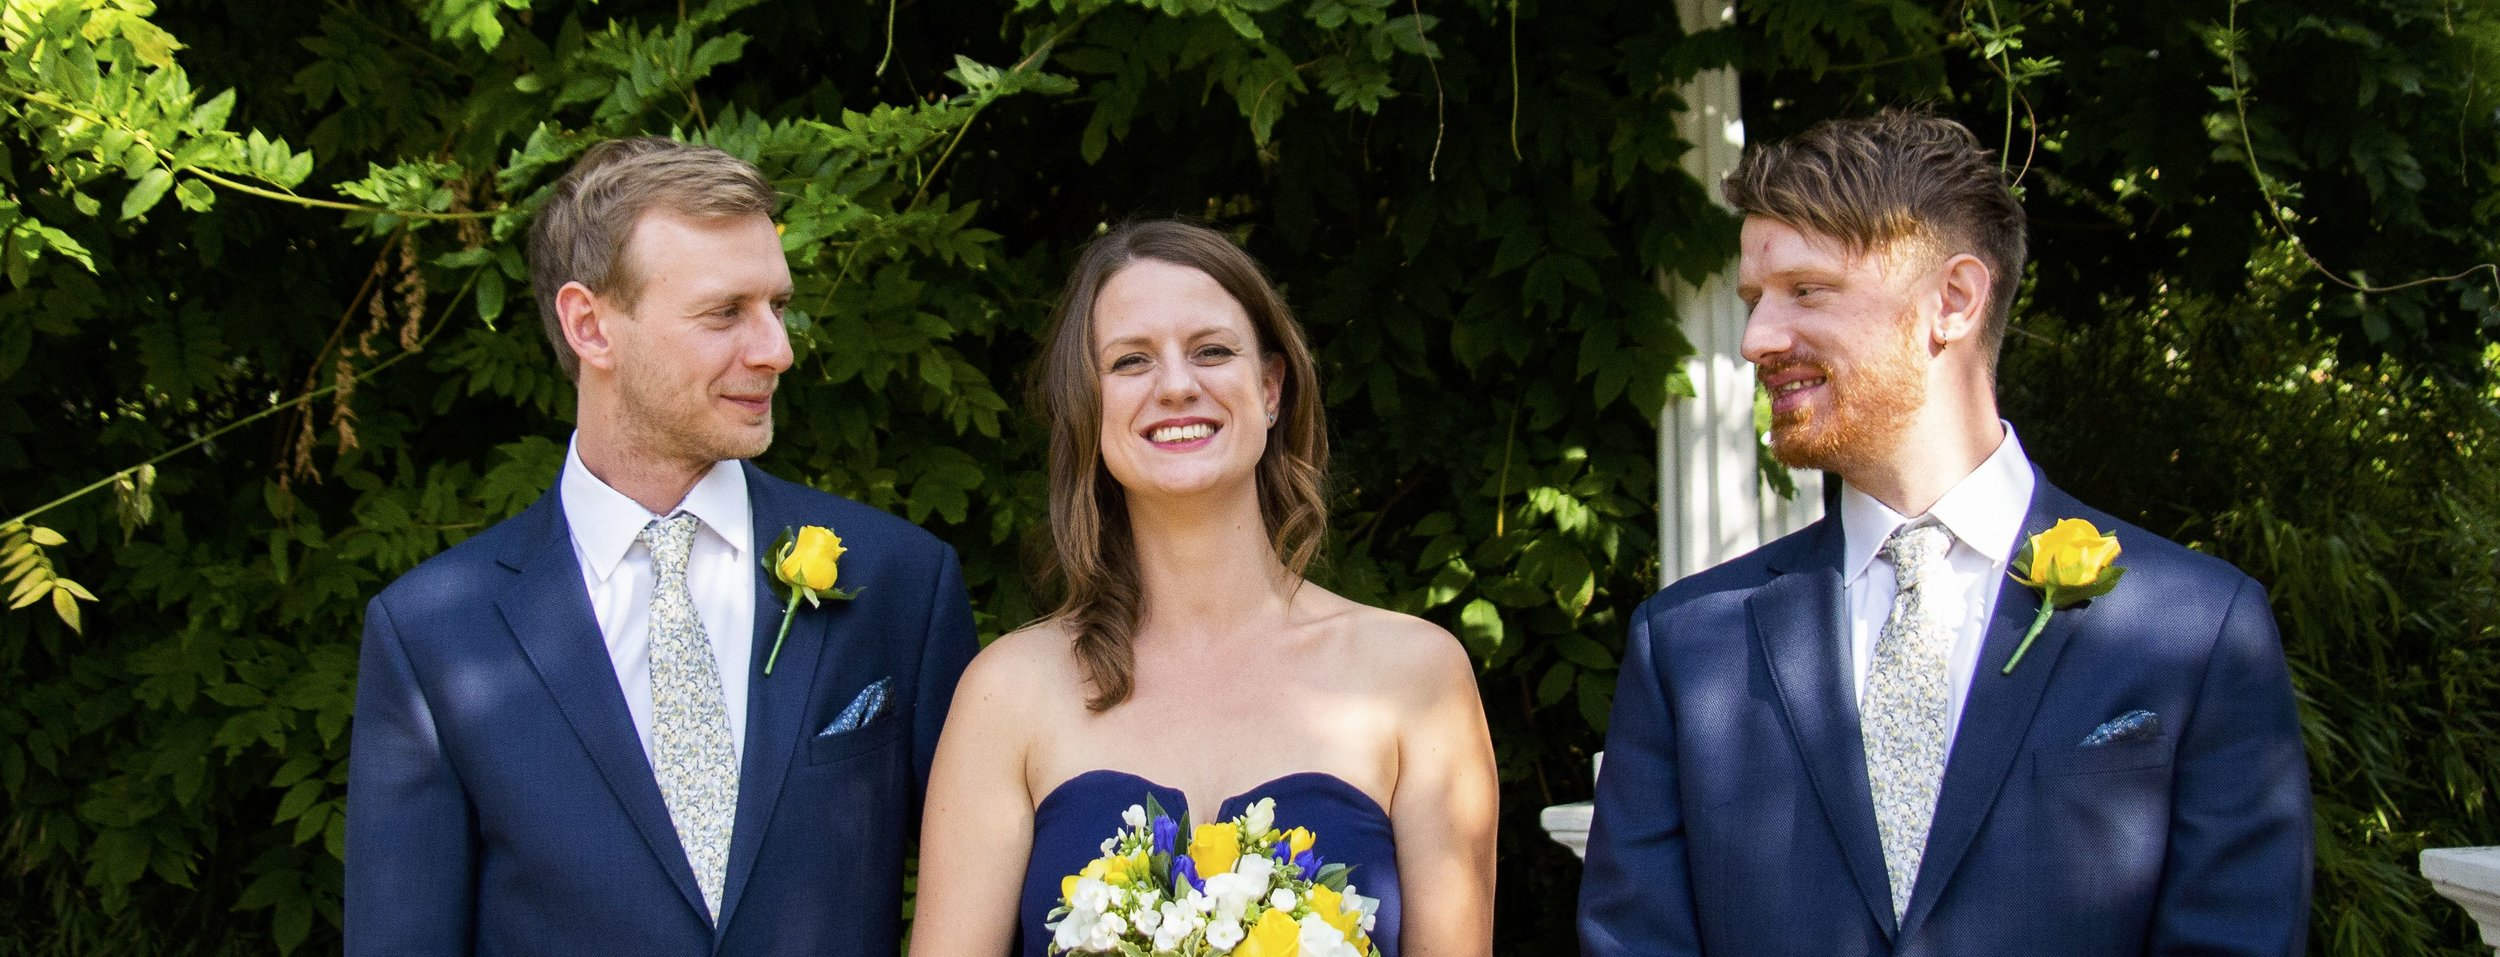 Caroline & Stuart Letchworth Hall Wedding 46